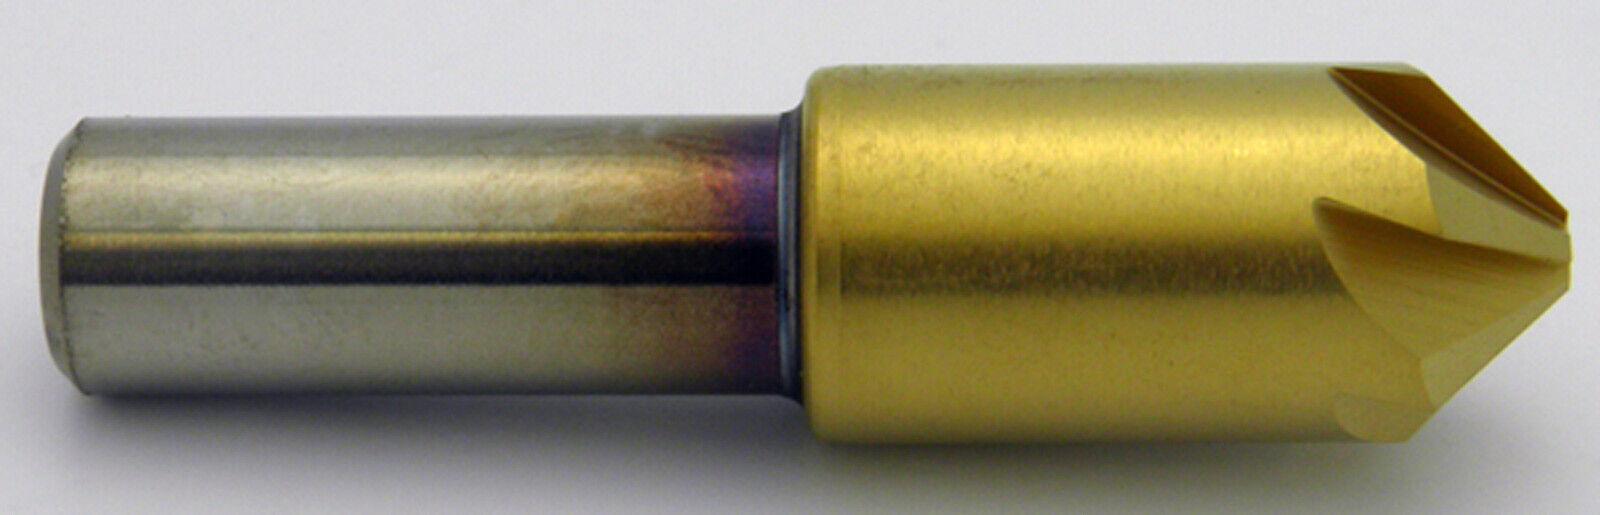 "3//8/"" 82° Degree 6 Flute Cobalt TiN Coated Countersink Melin USA #18207"